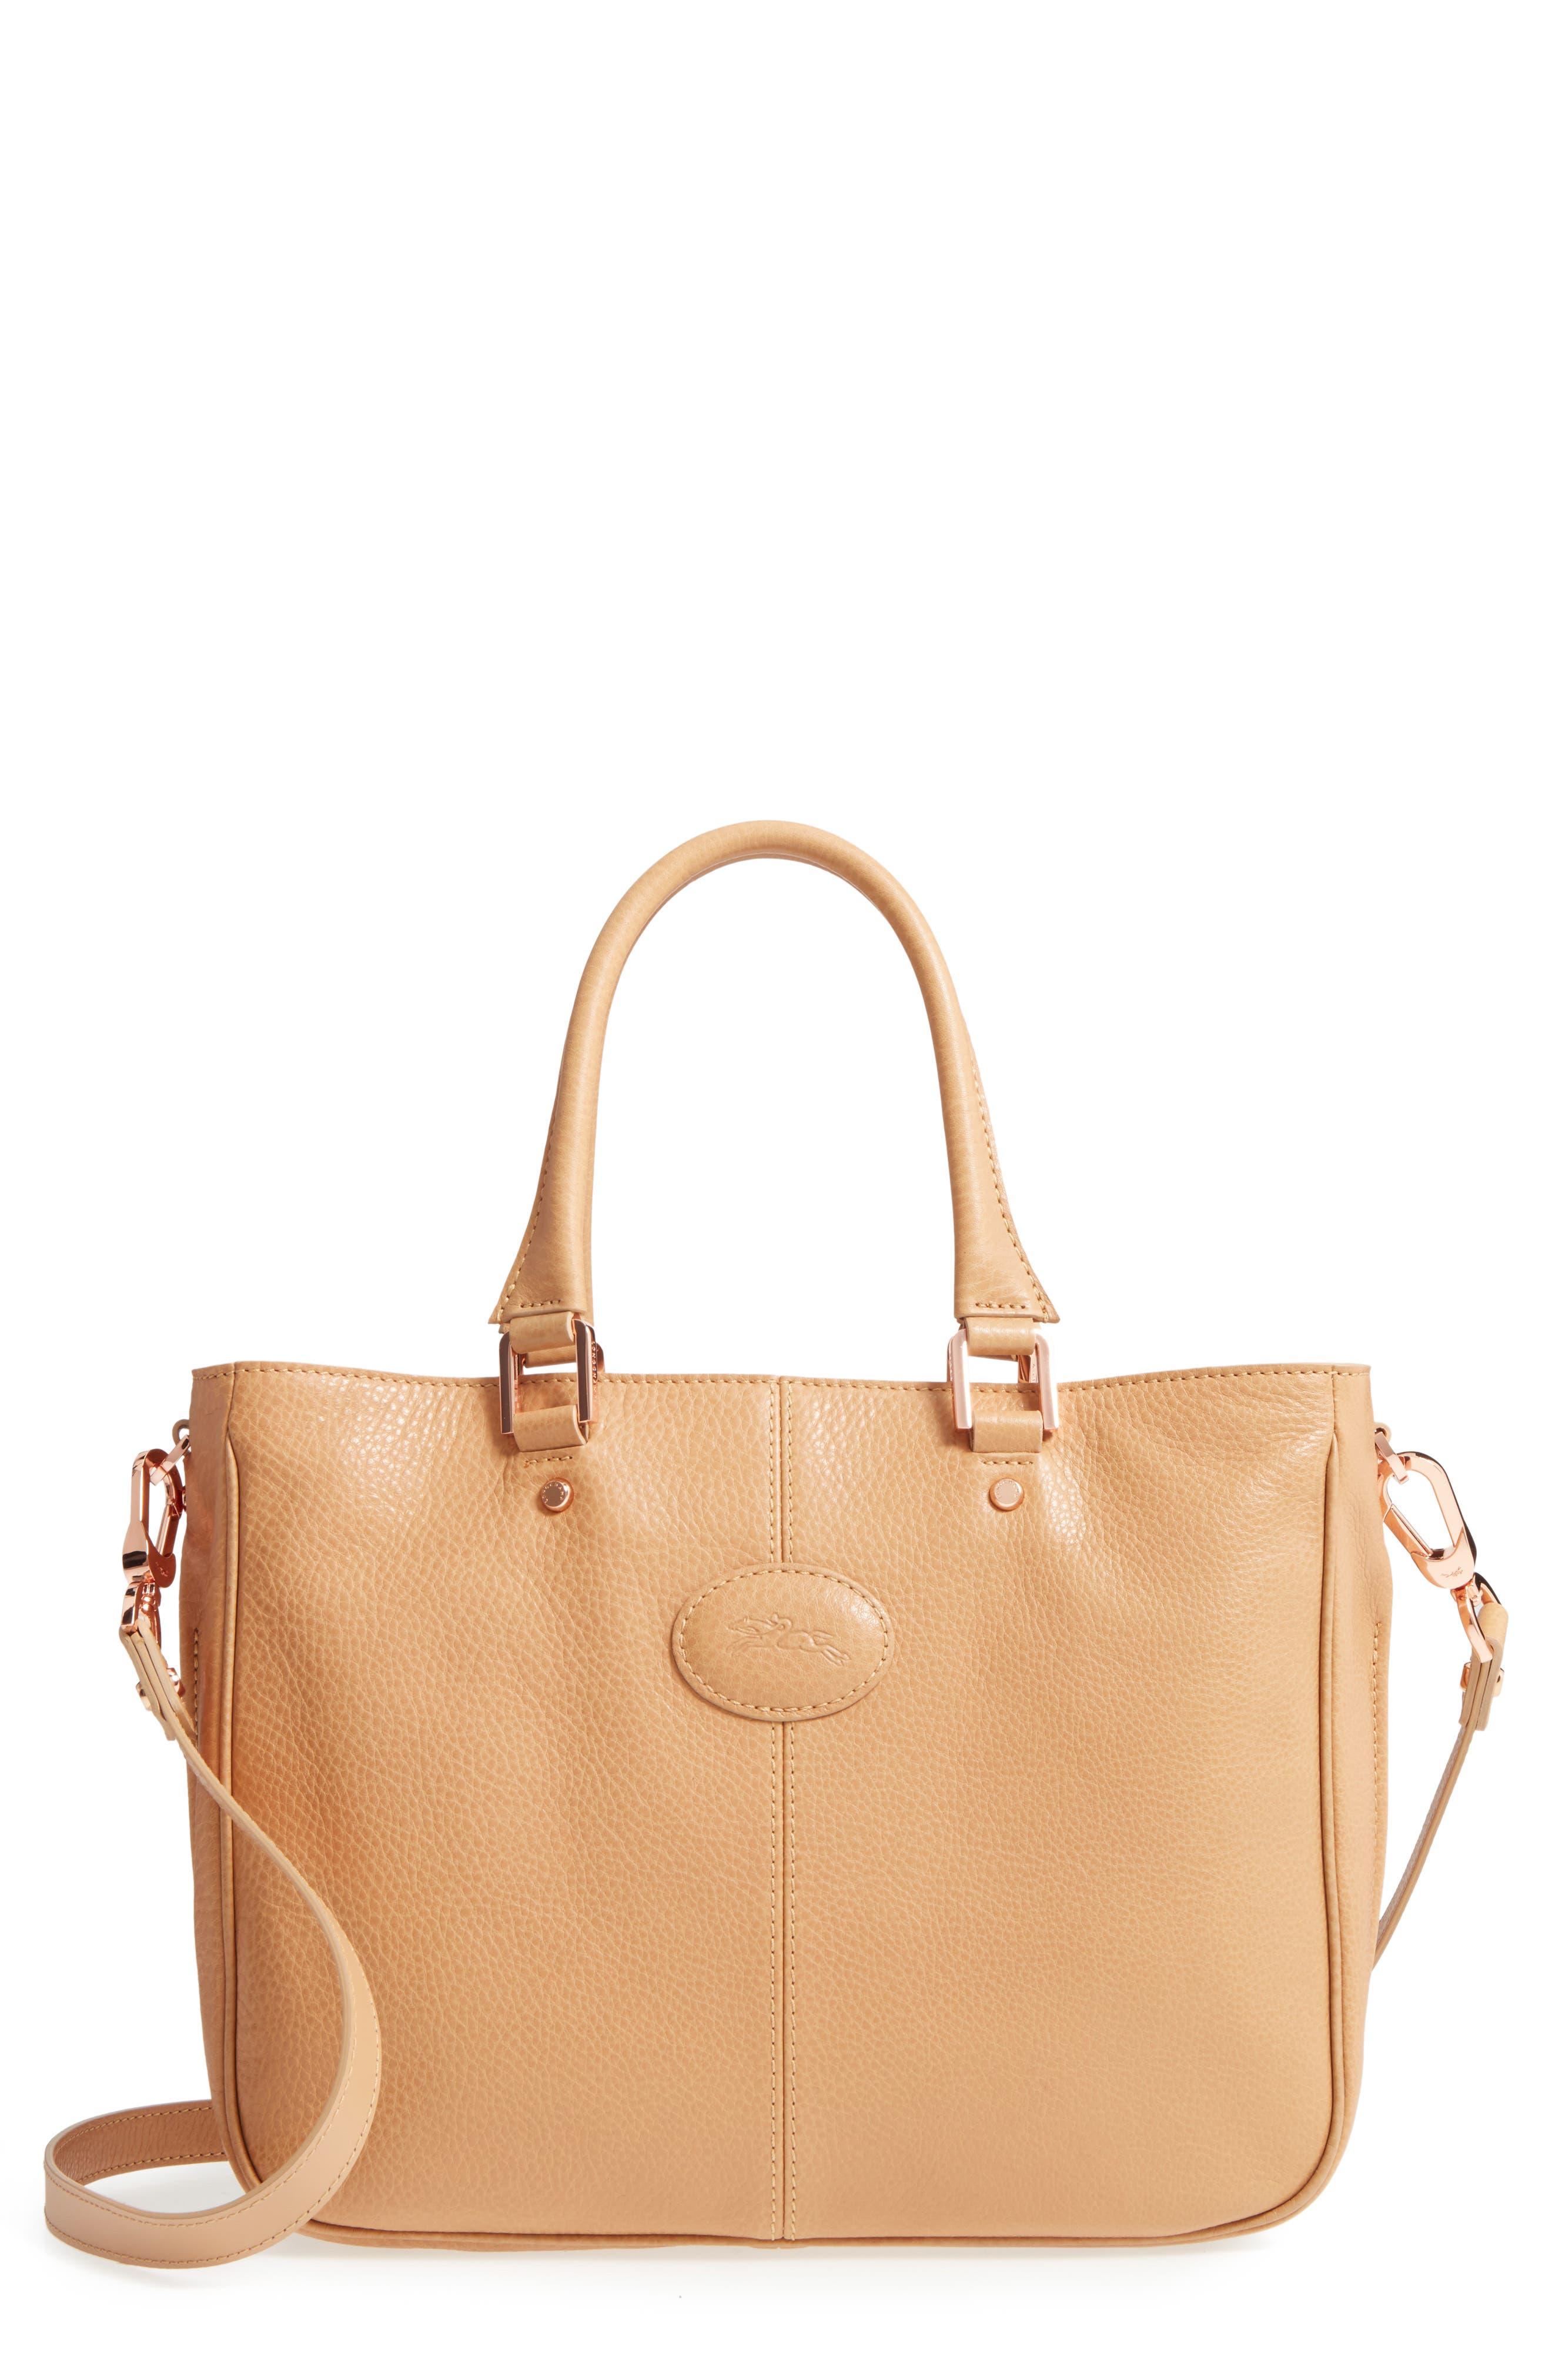 Alternate Image 1 Selected - Longchamp Mystery Leather Satchel